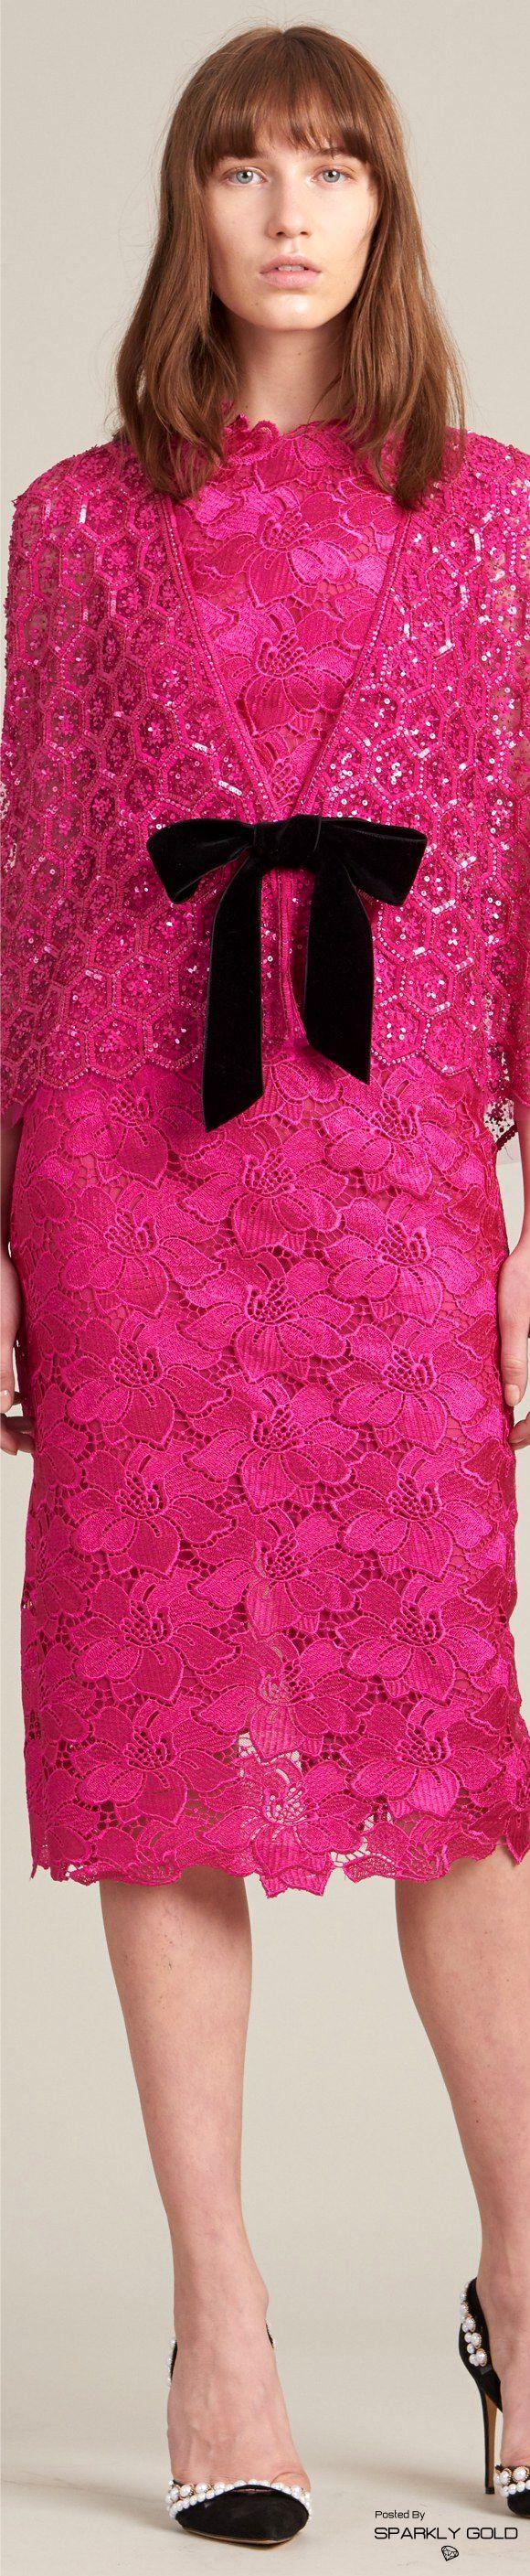 Contemporáneo Vestido De Novia Escarlata Monique Lhuillier Molde ...